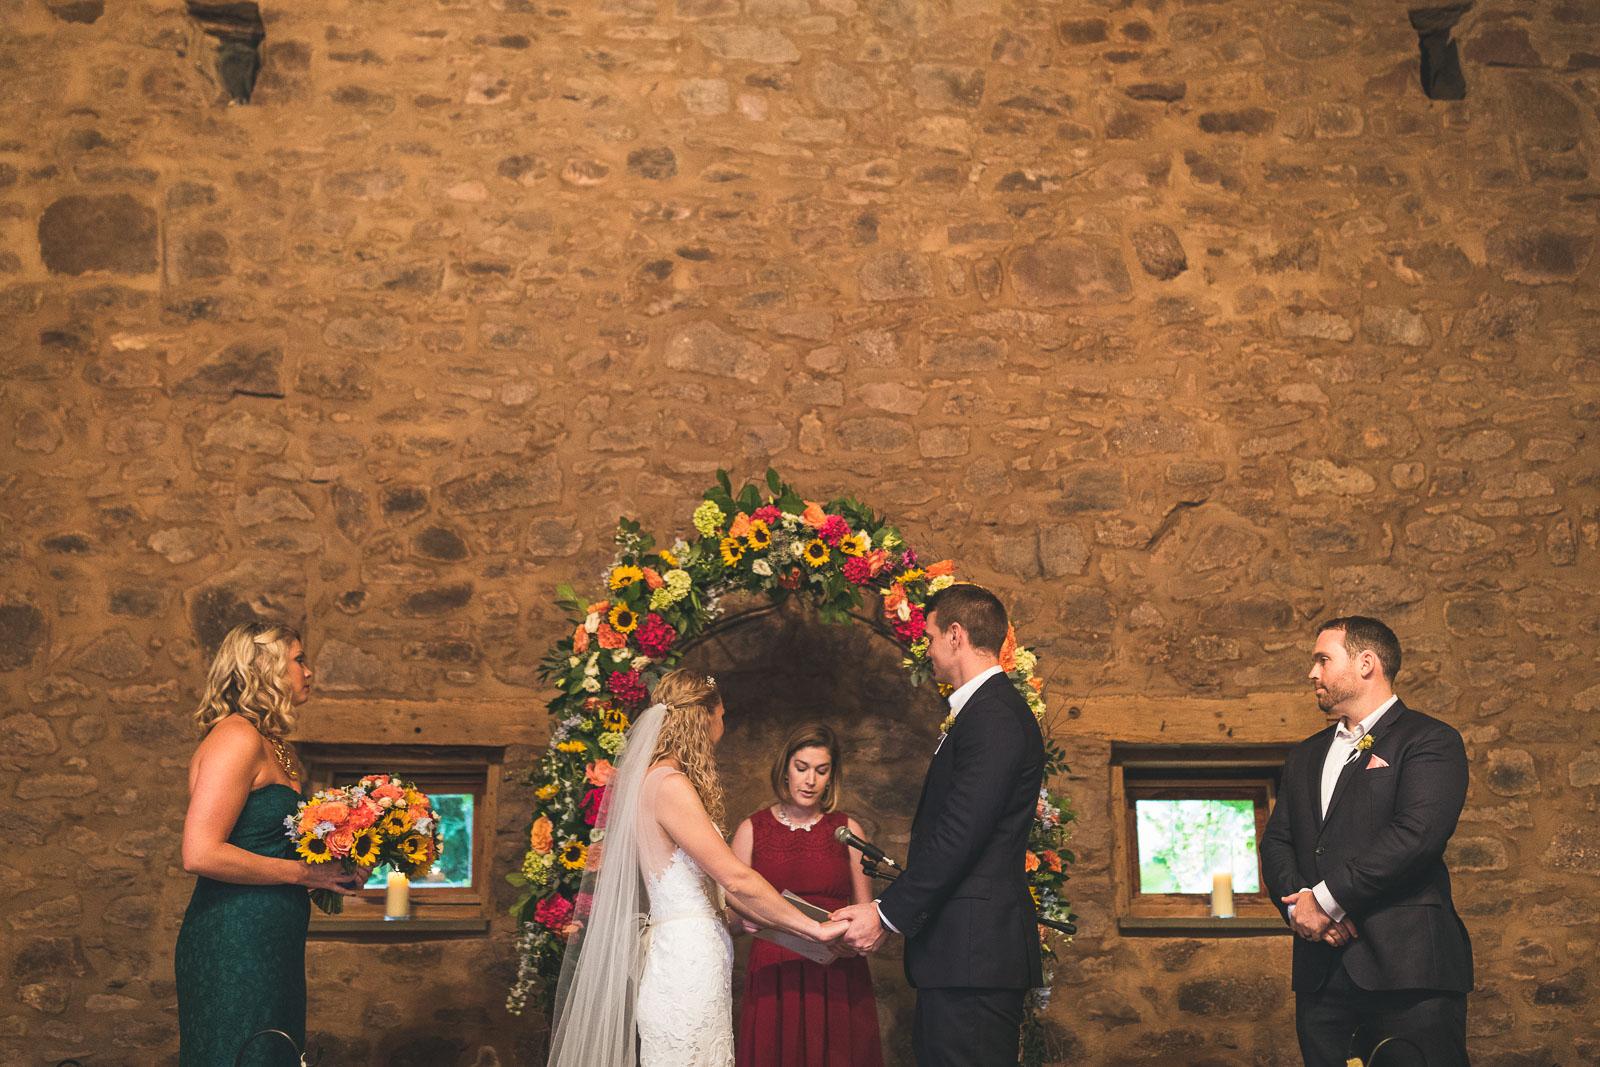 Willowwood Arboretum Wedding Ceremony